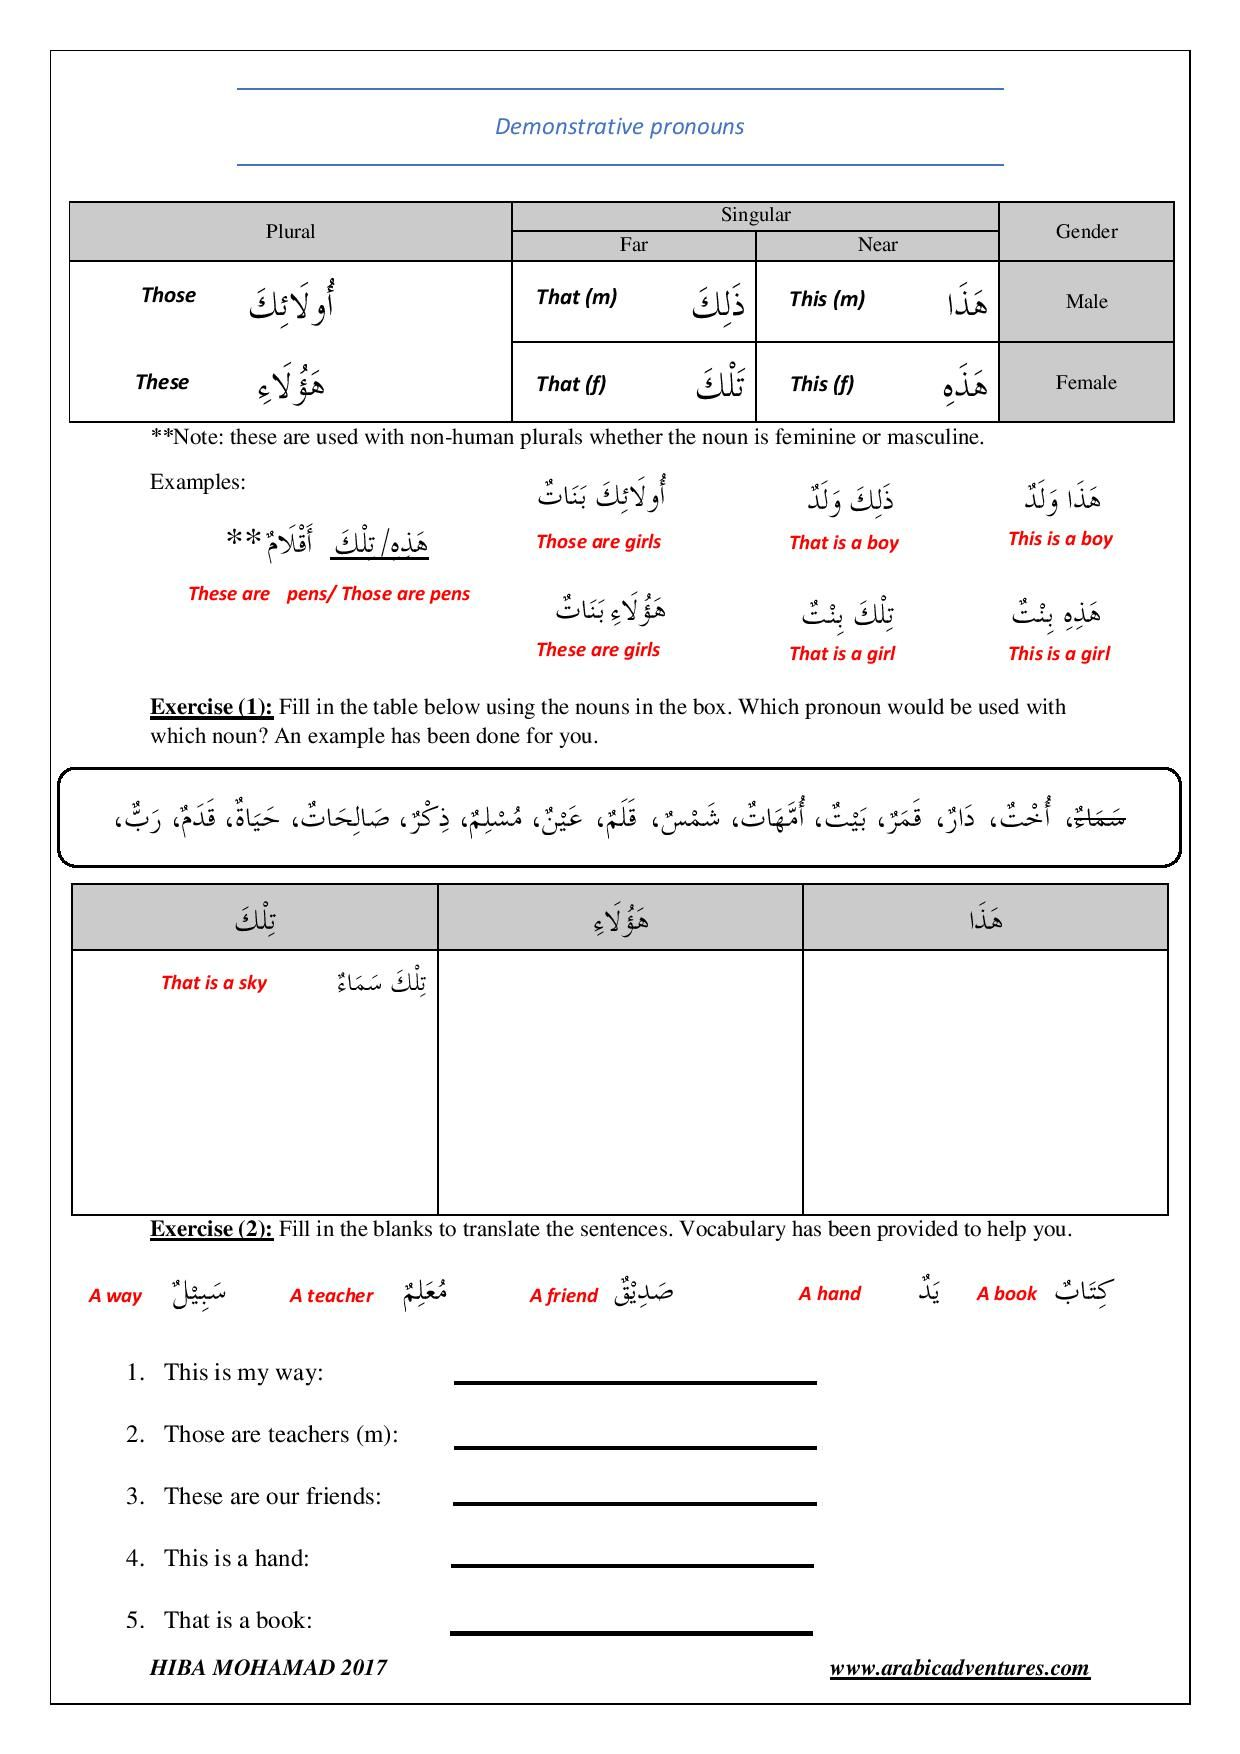 hight resolution of Demonstrative pronouns worksheet www.arabicadventures.com   Demonstrative  pronouns